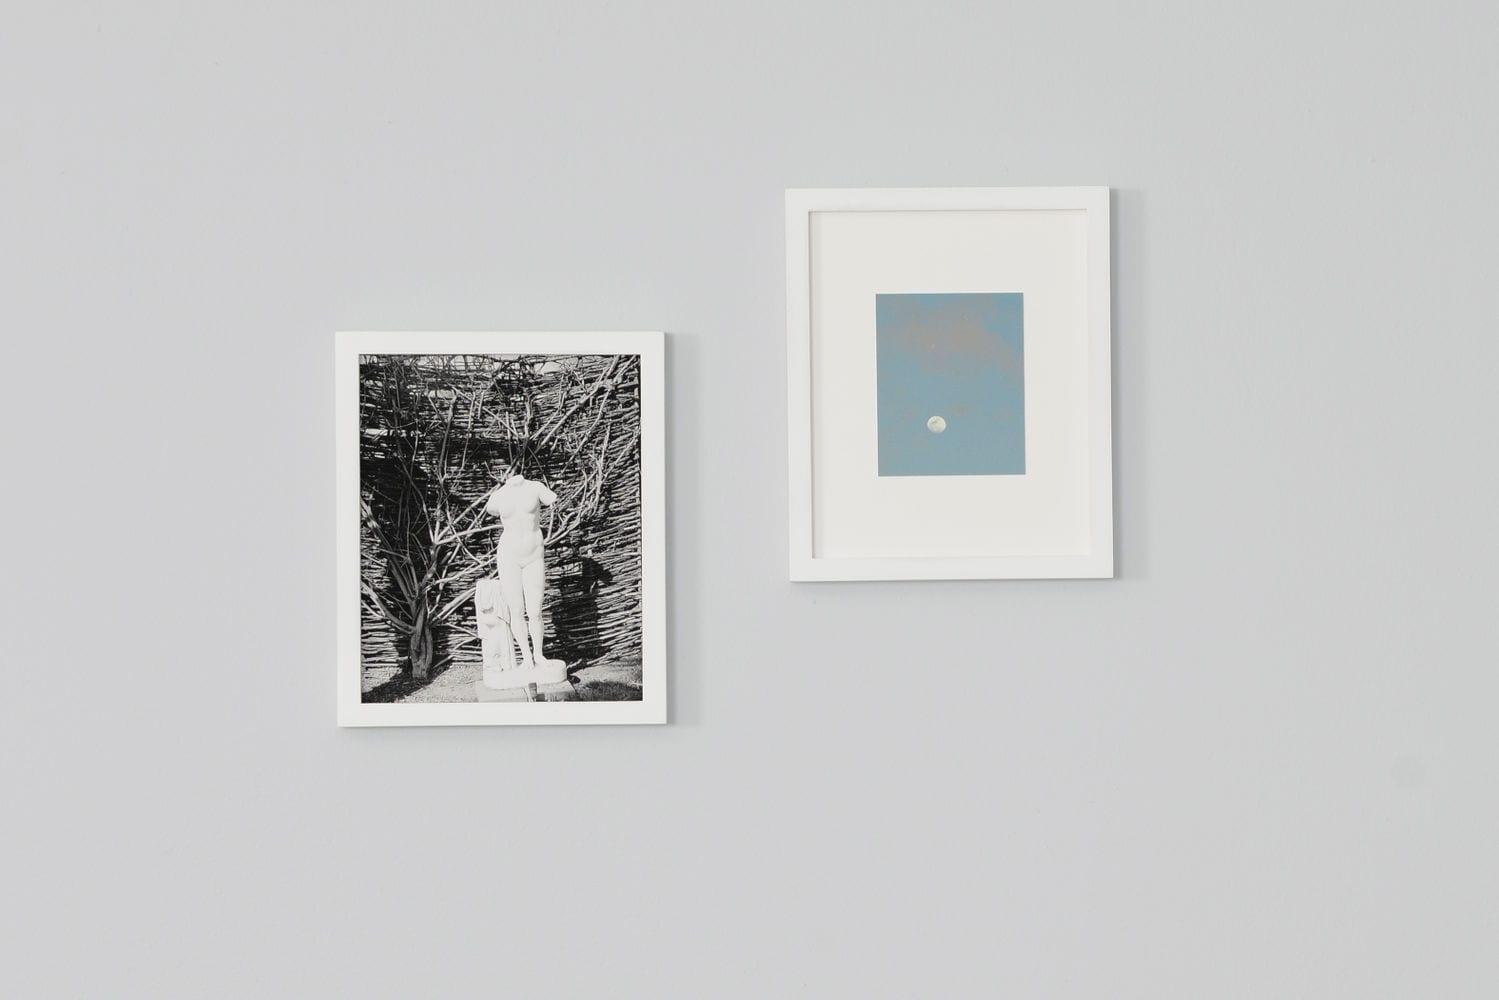 24-anikasteppe-installationviewofheadlesswomanandmissingpiece